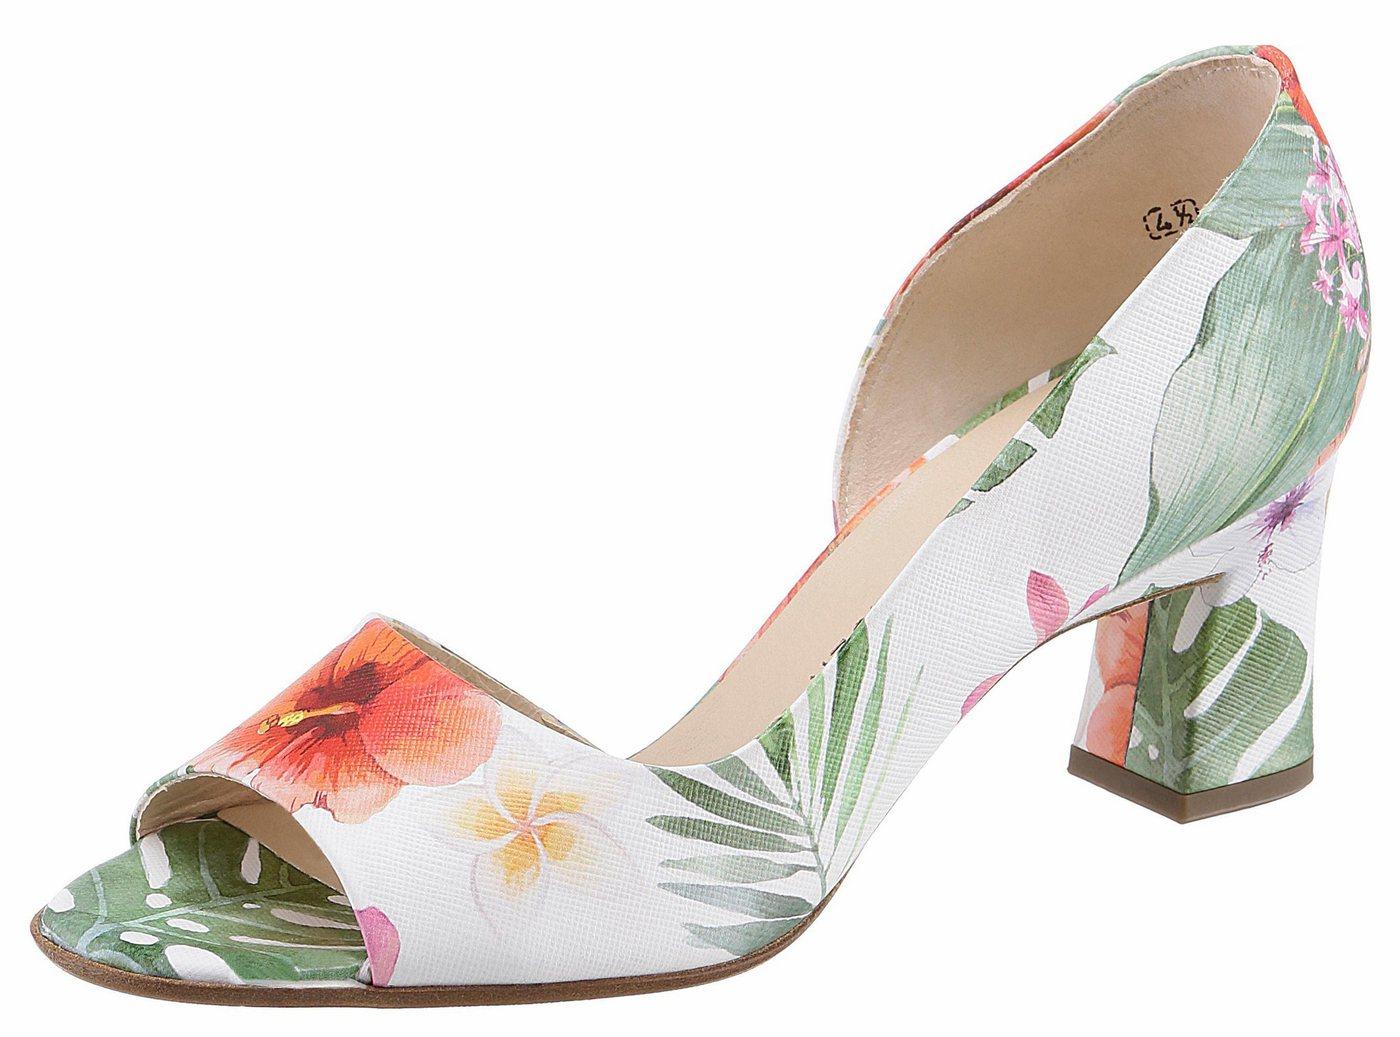 Damen Peter Kaiser Elana Peeptoepumps mit Blumendruck bunt,mehrfarbig | 04060102152805